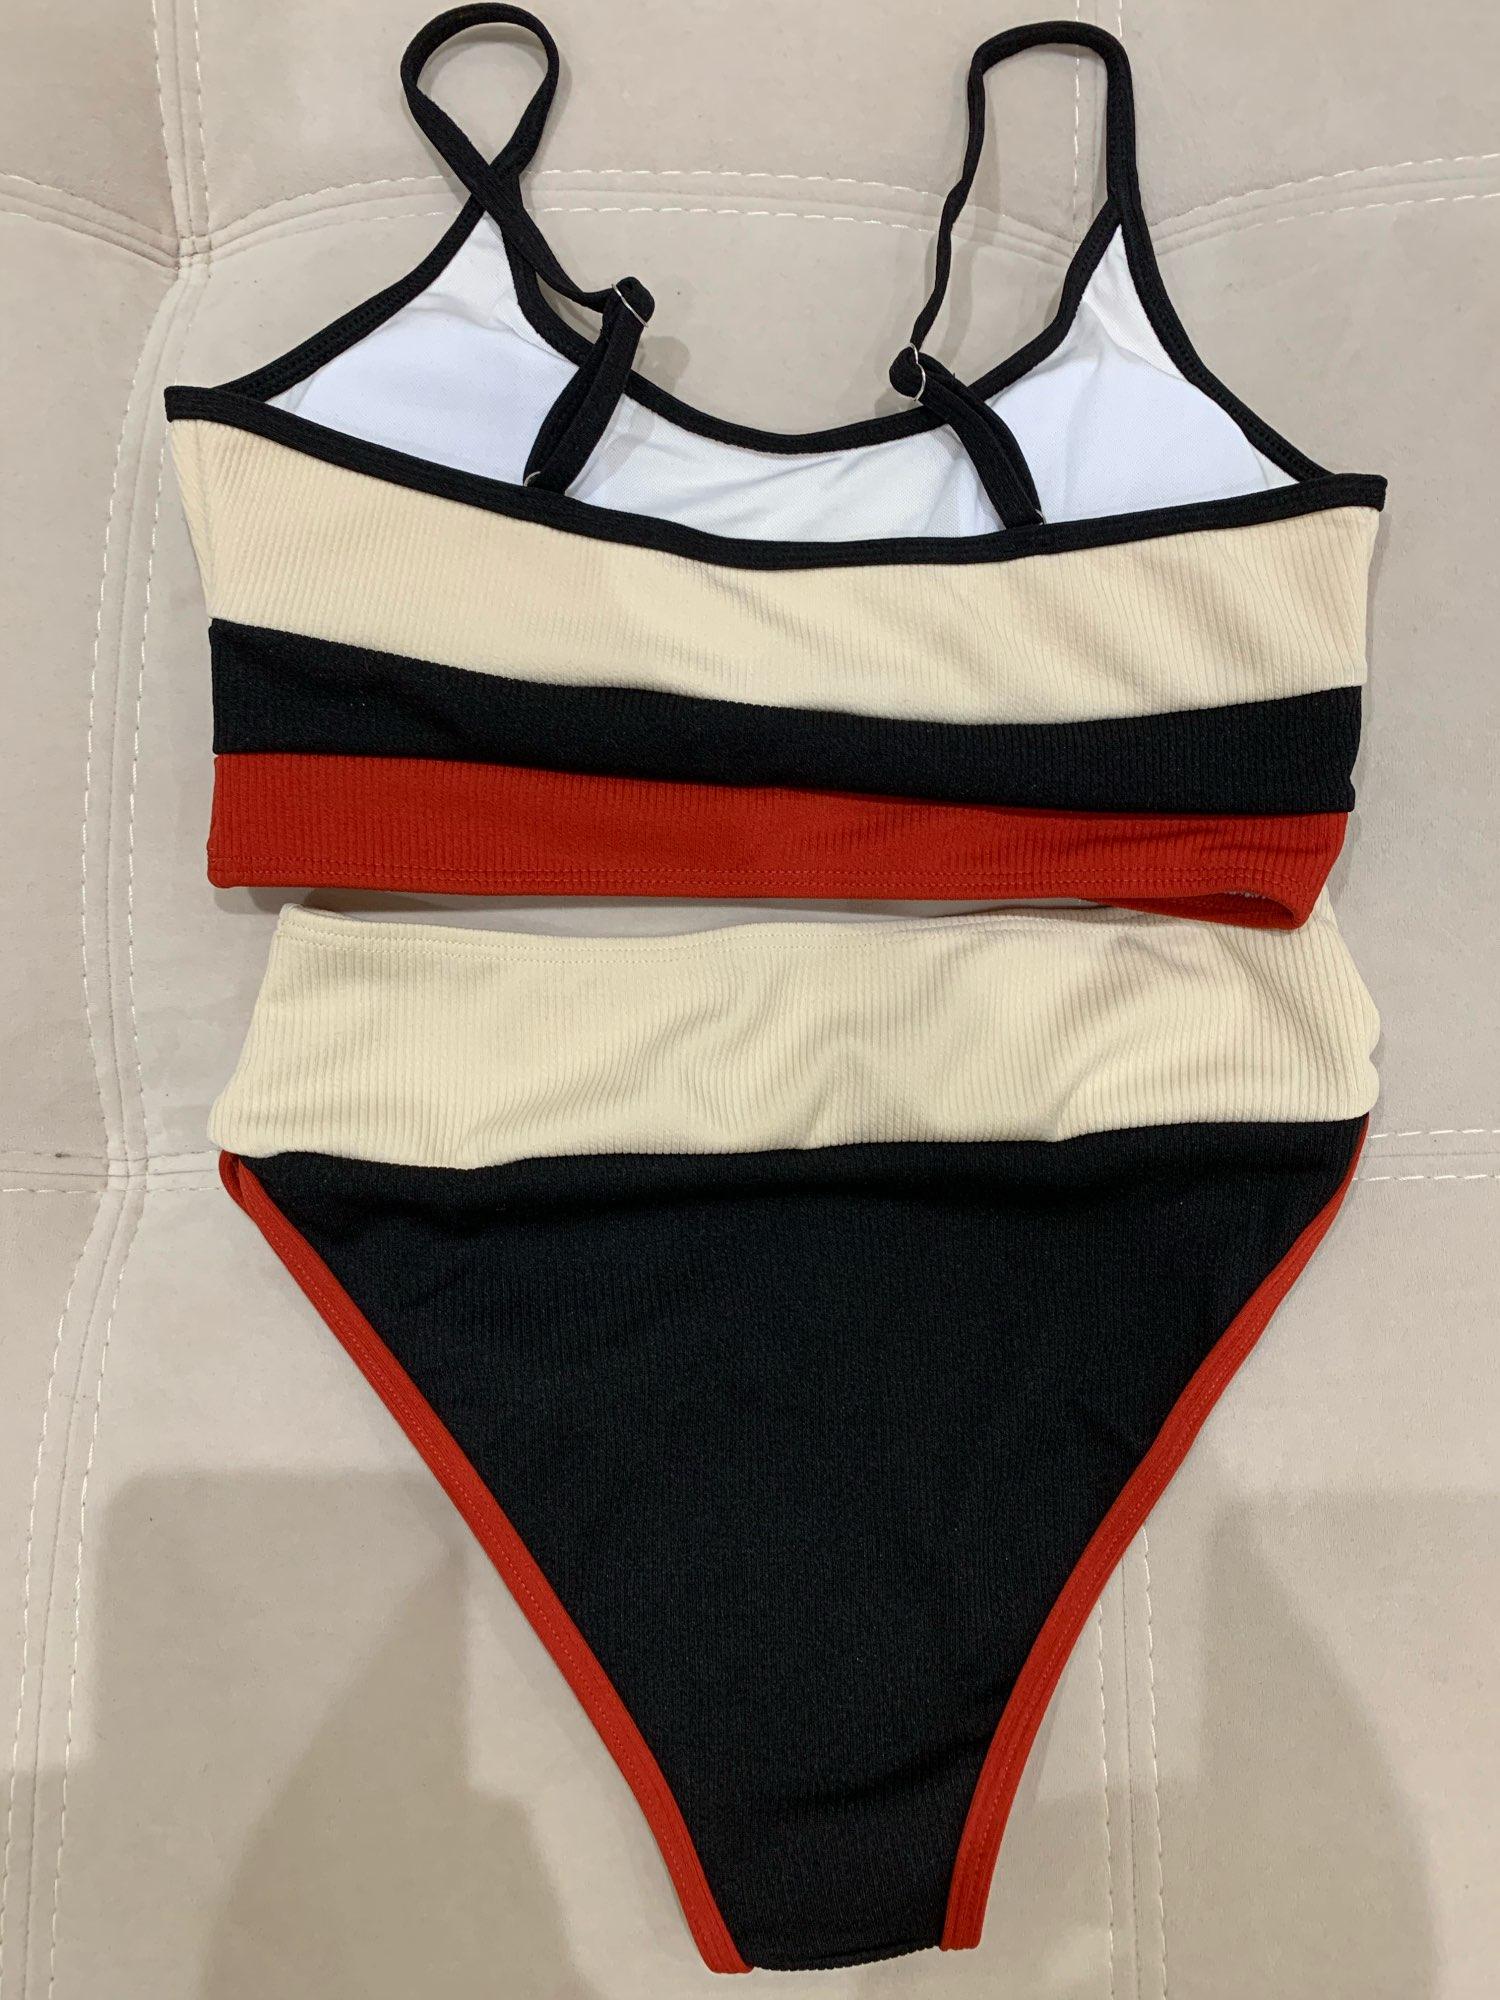 Push Up Swimsuit Female Patchwork Swimwear For Women Bathing Suit High Waist Bikini Set Sport Wear Swimming Suit Sexy Bikini|Bikini Set|   - AliExpress